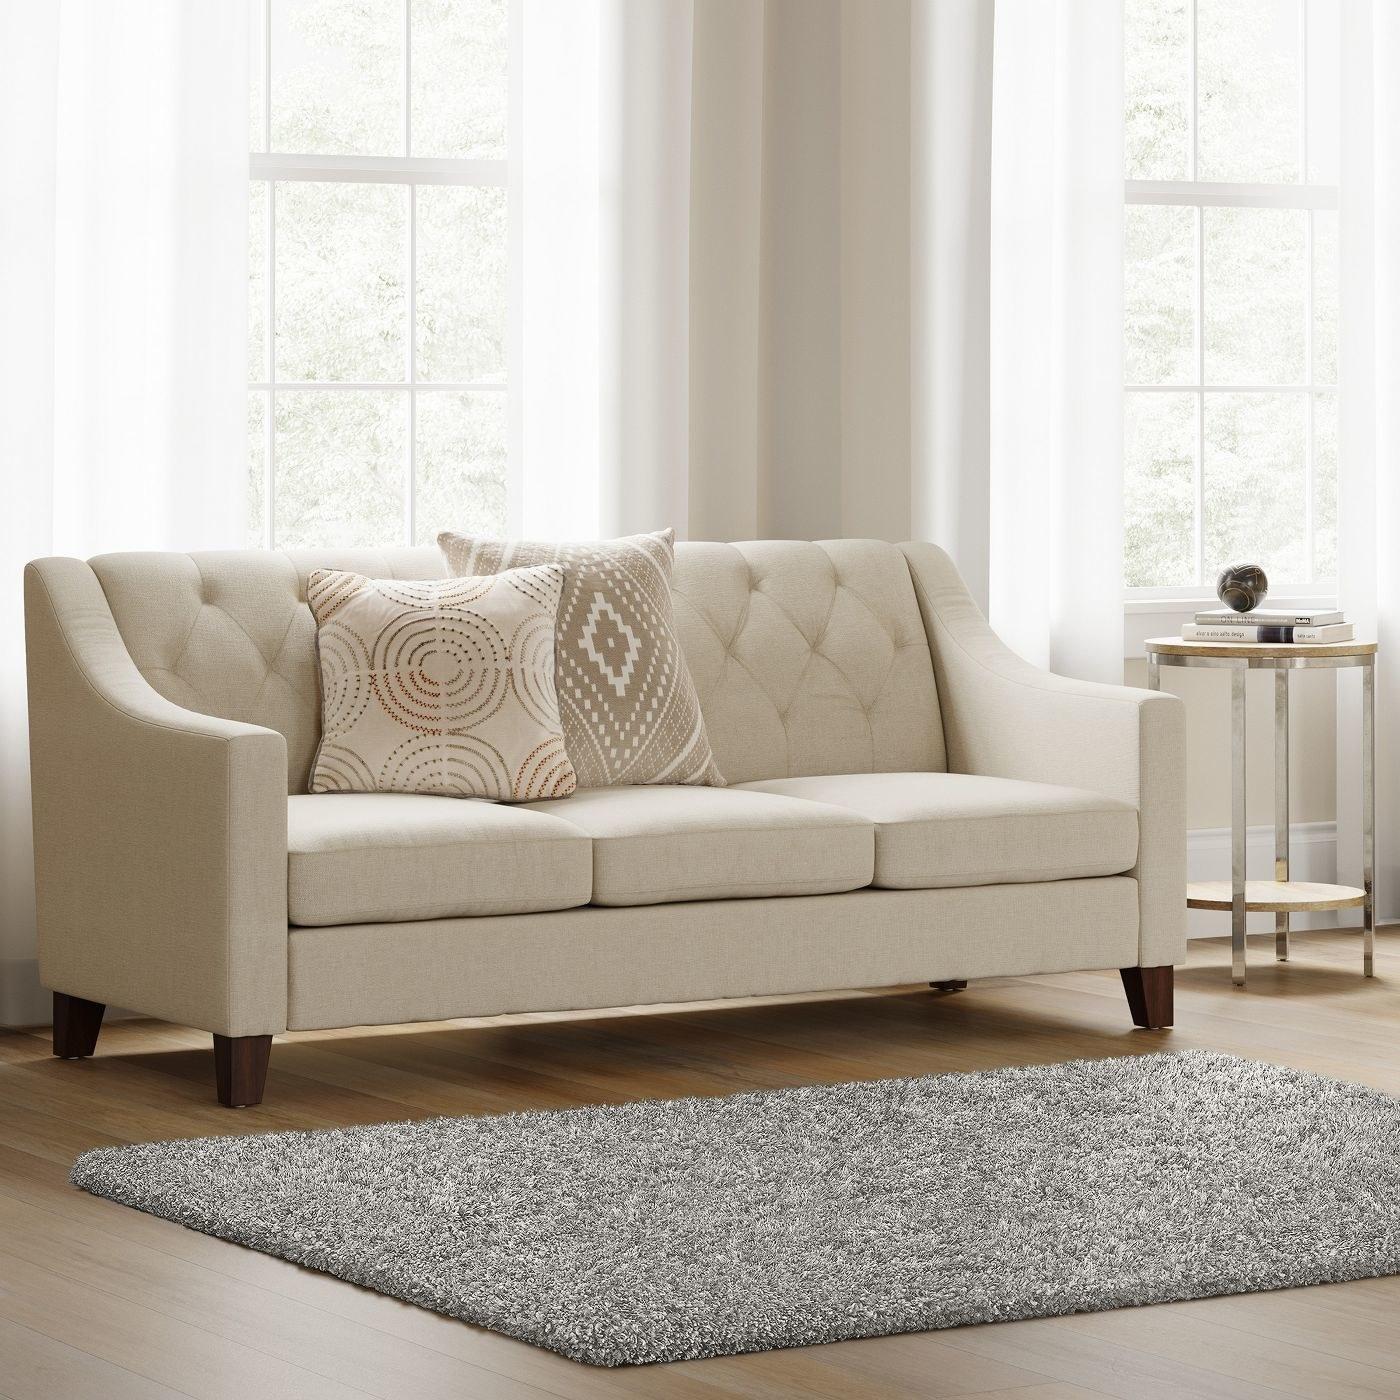 Shag rug in a home